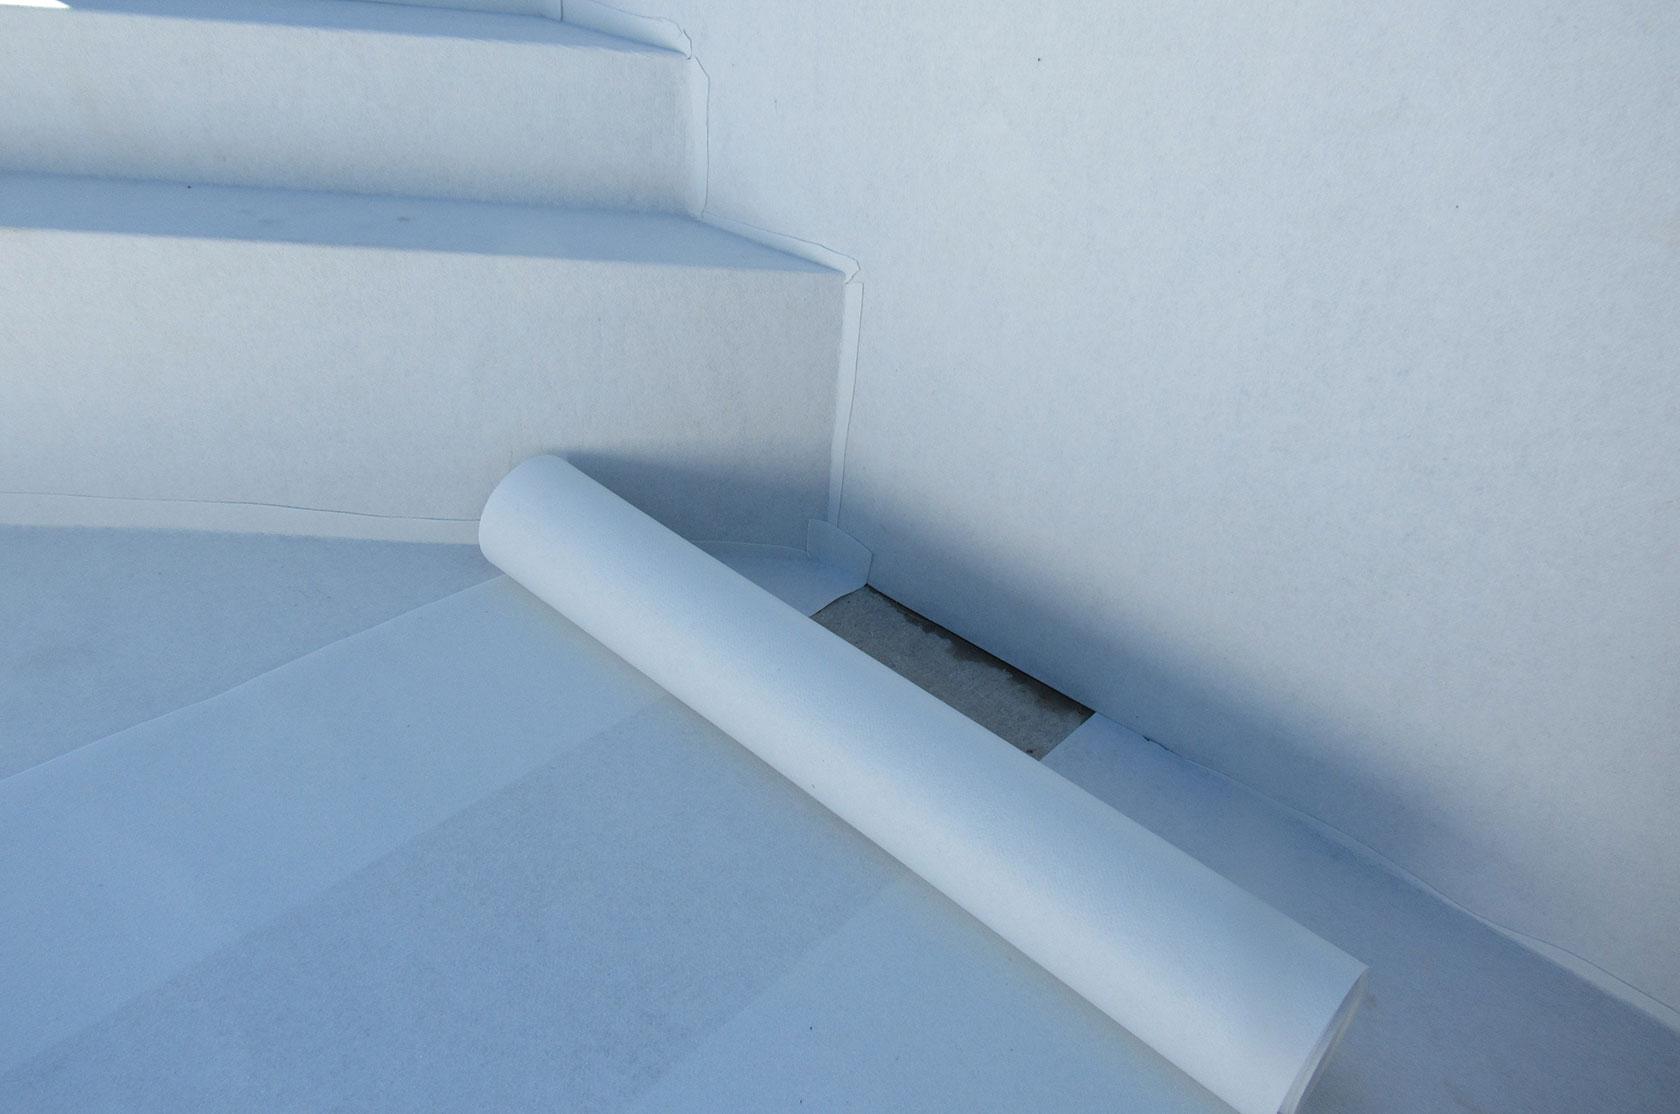 Styroporpool 600 x 300 x 150 cm komplettset mit for Poolfolie montieren